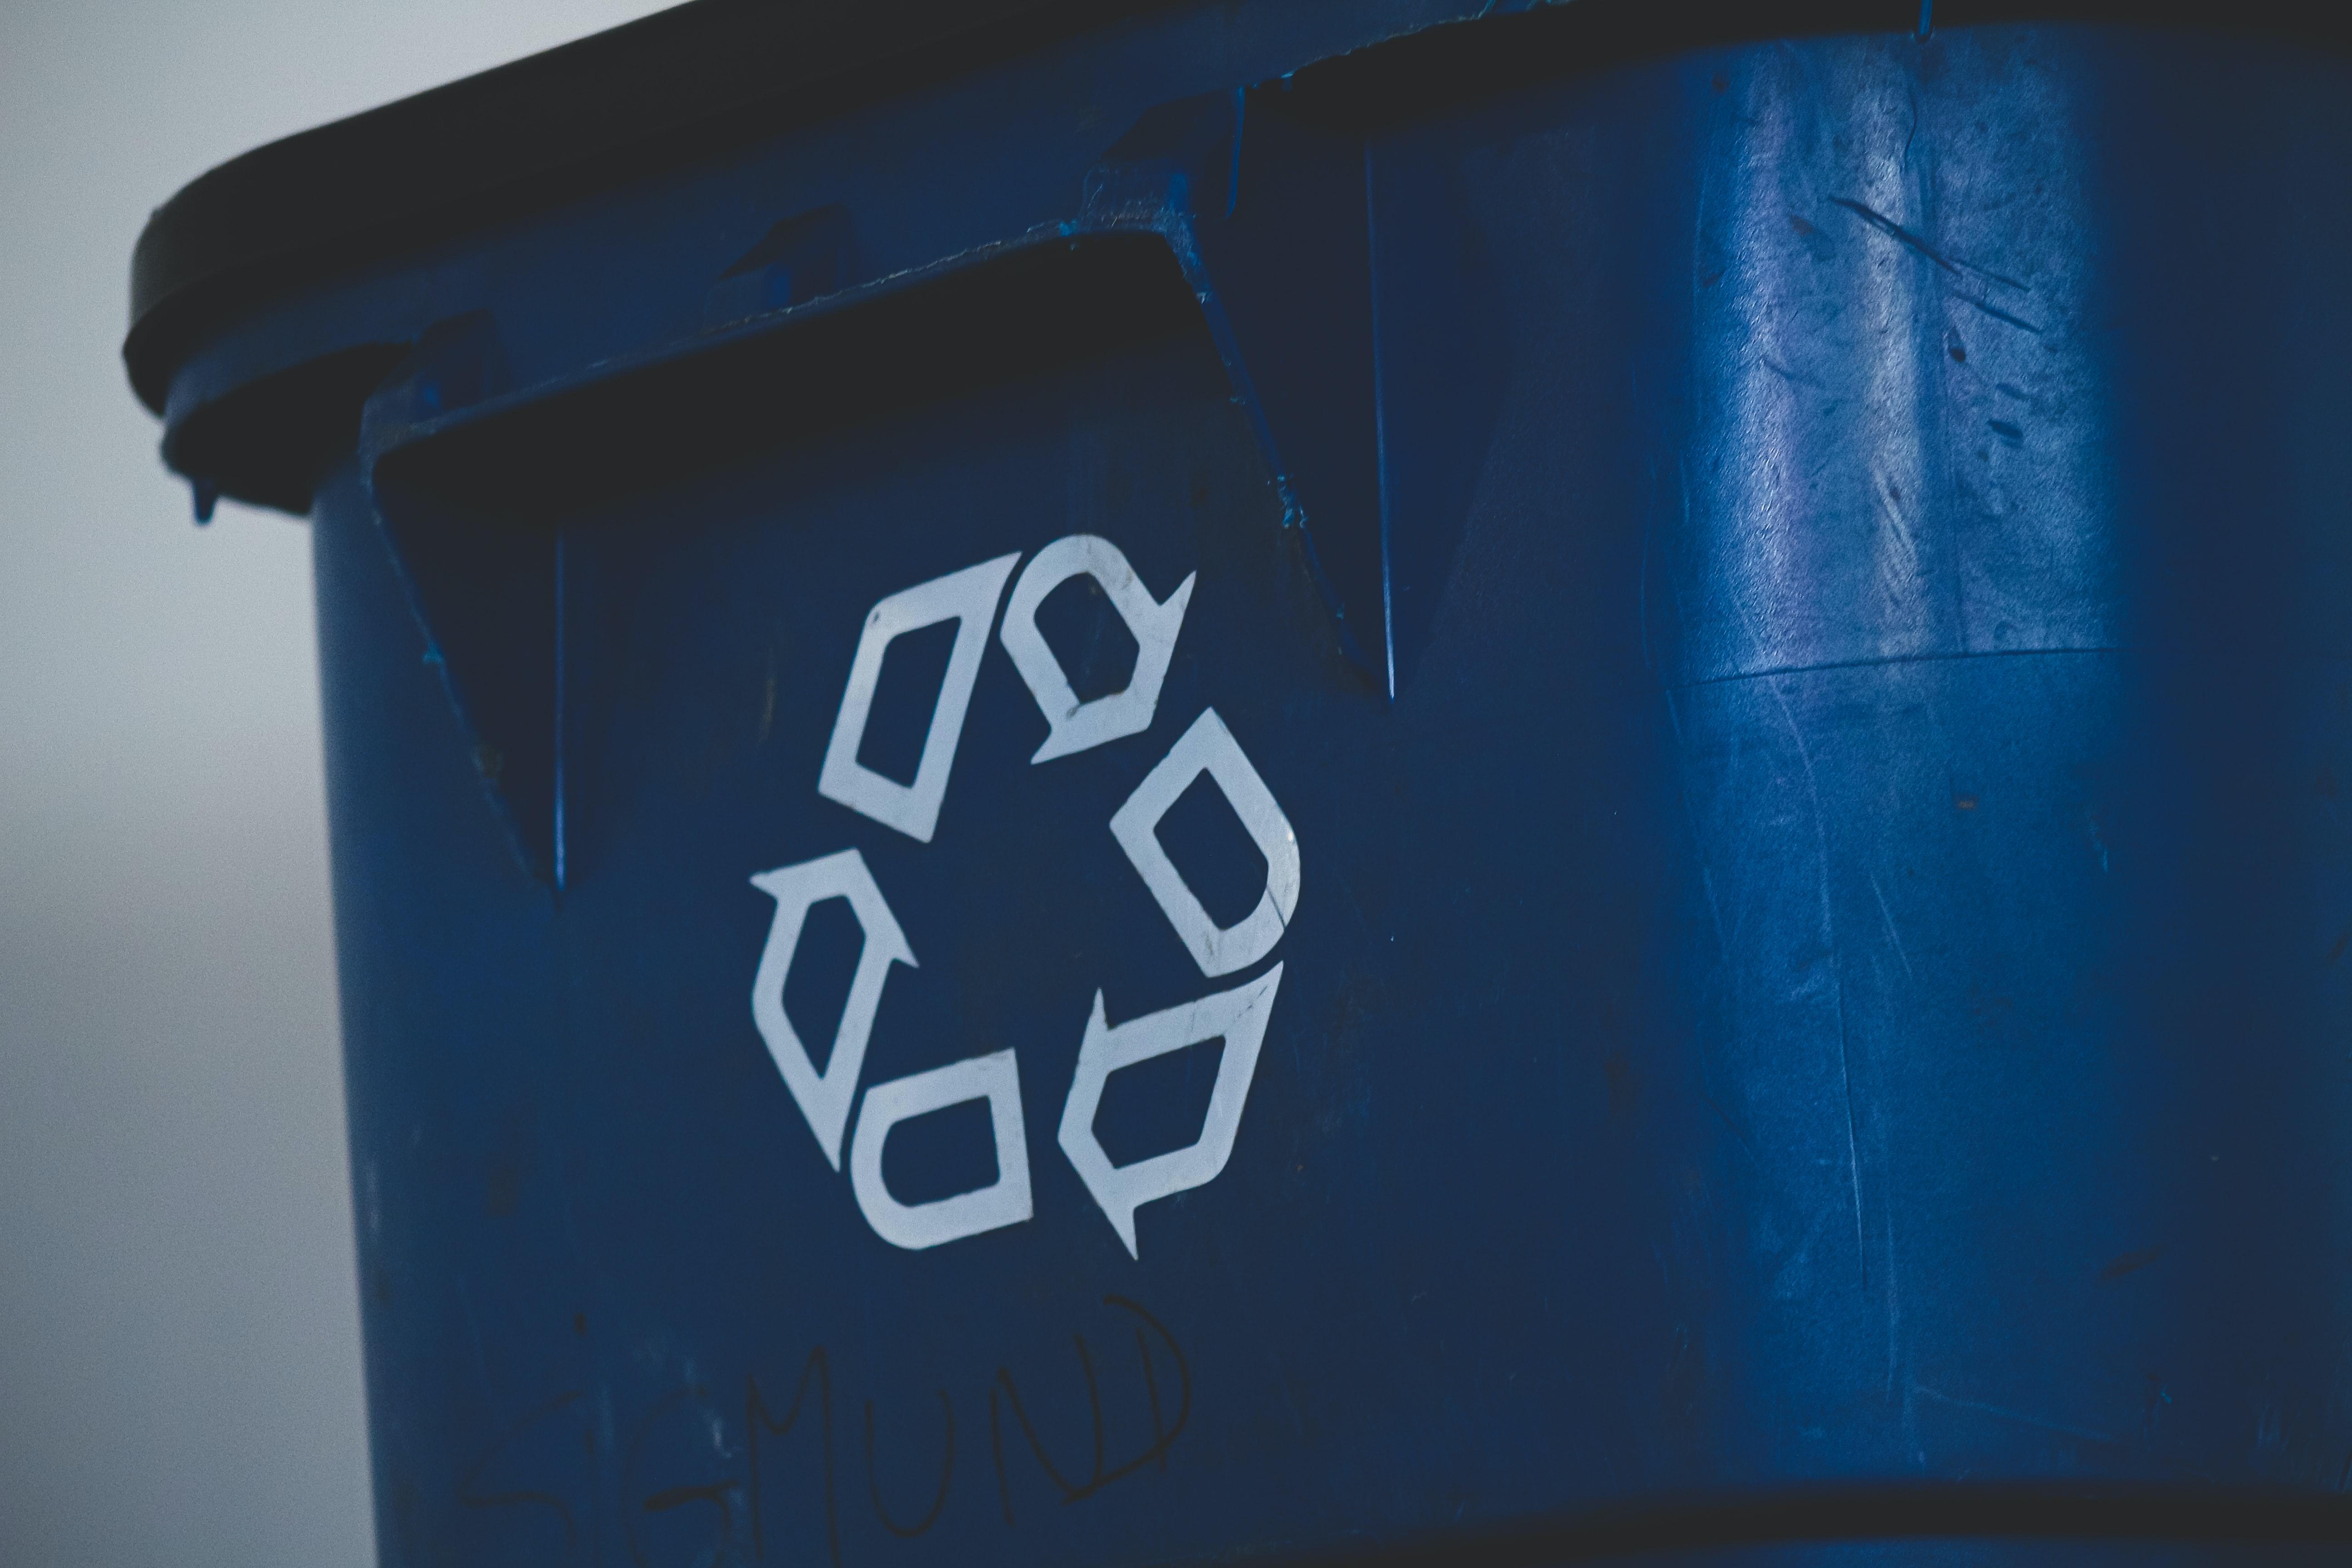 Recycling bin. Photo by @sigmund